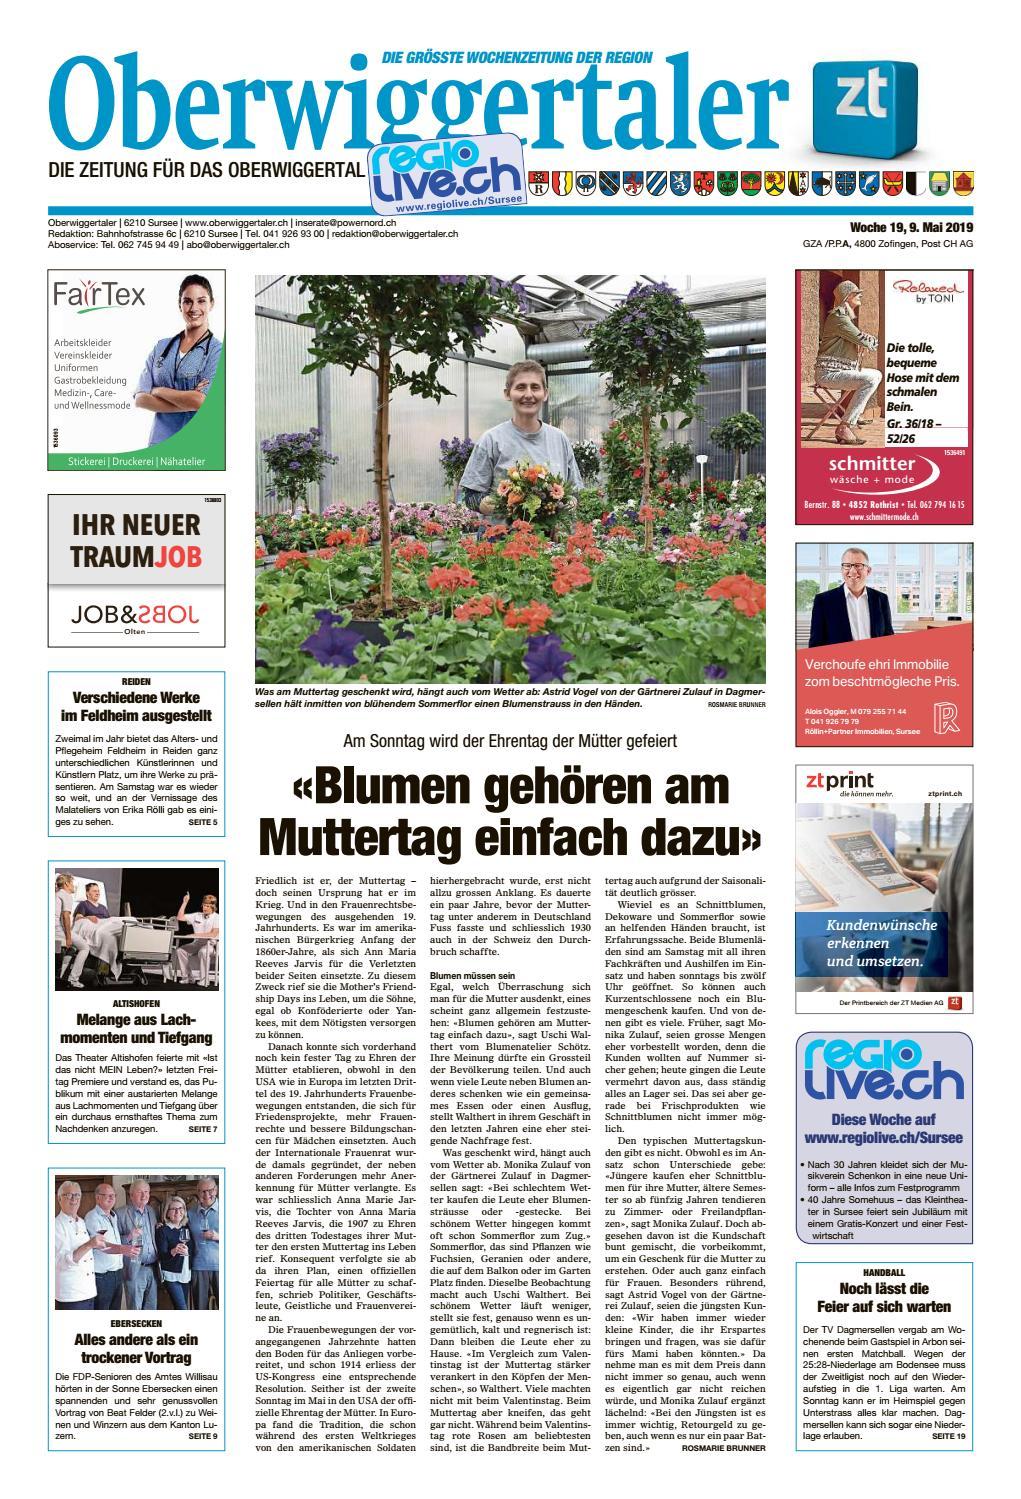 Partnerbrsen Mhleberg - flirt kostenlos Geneve